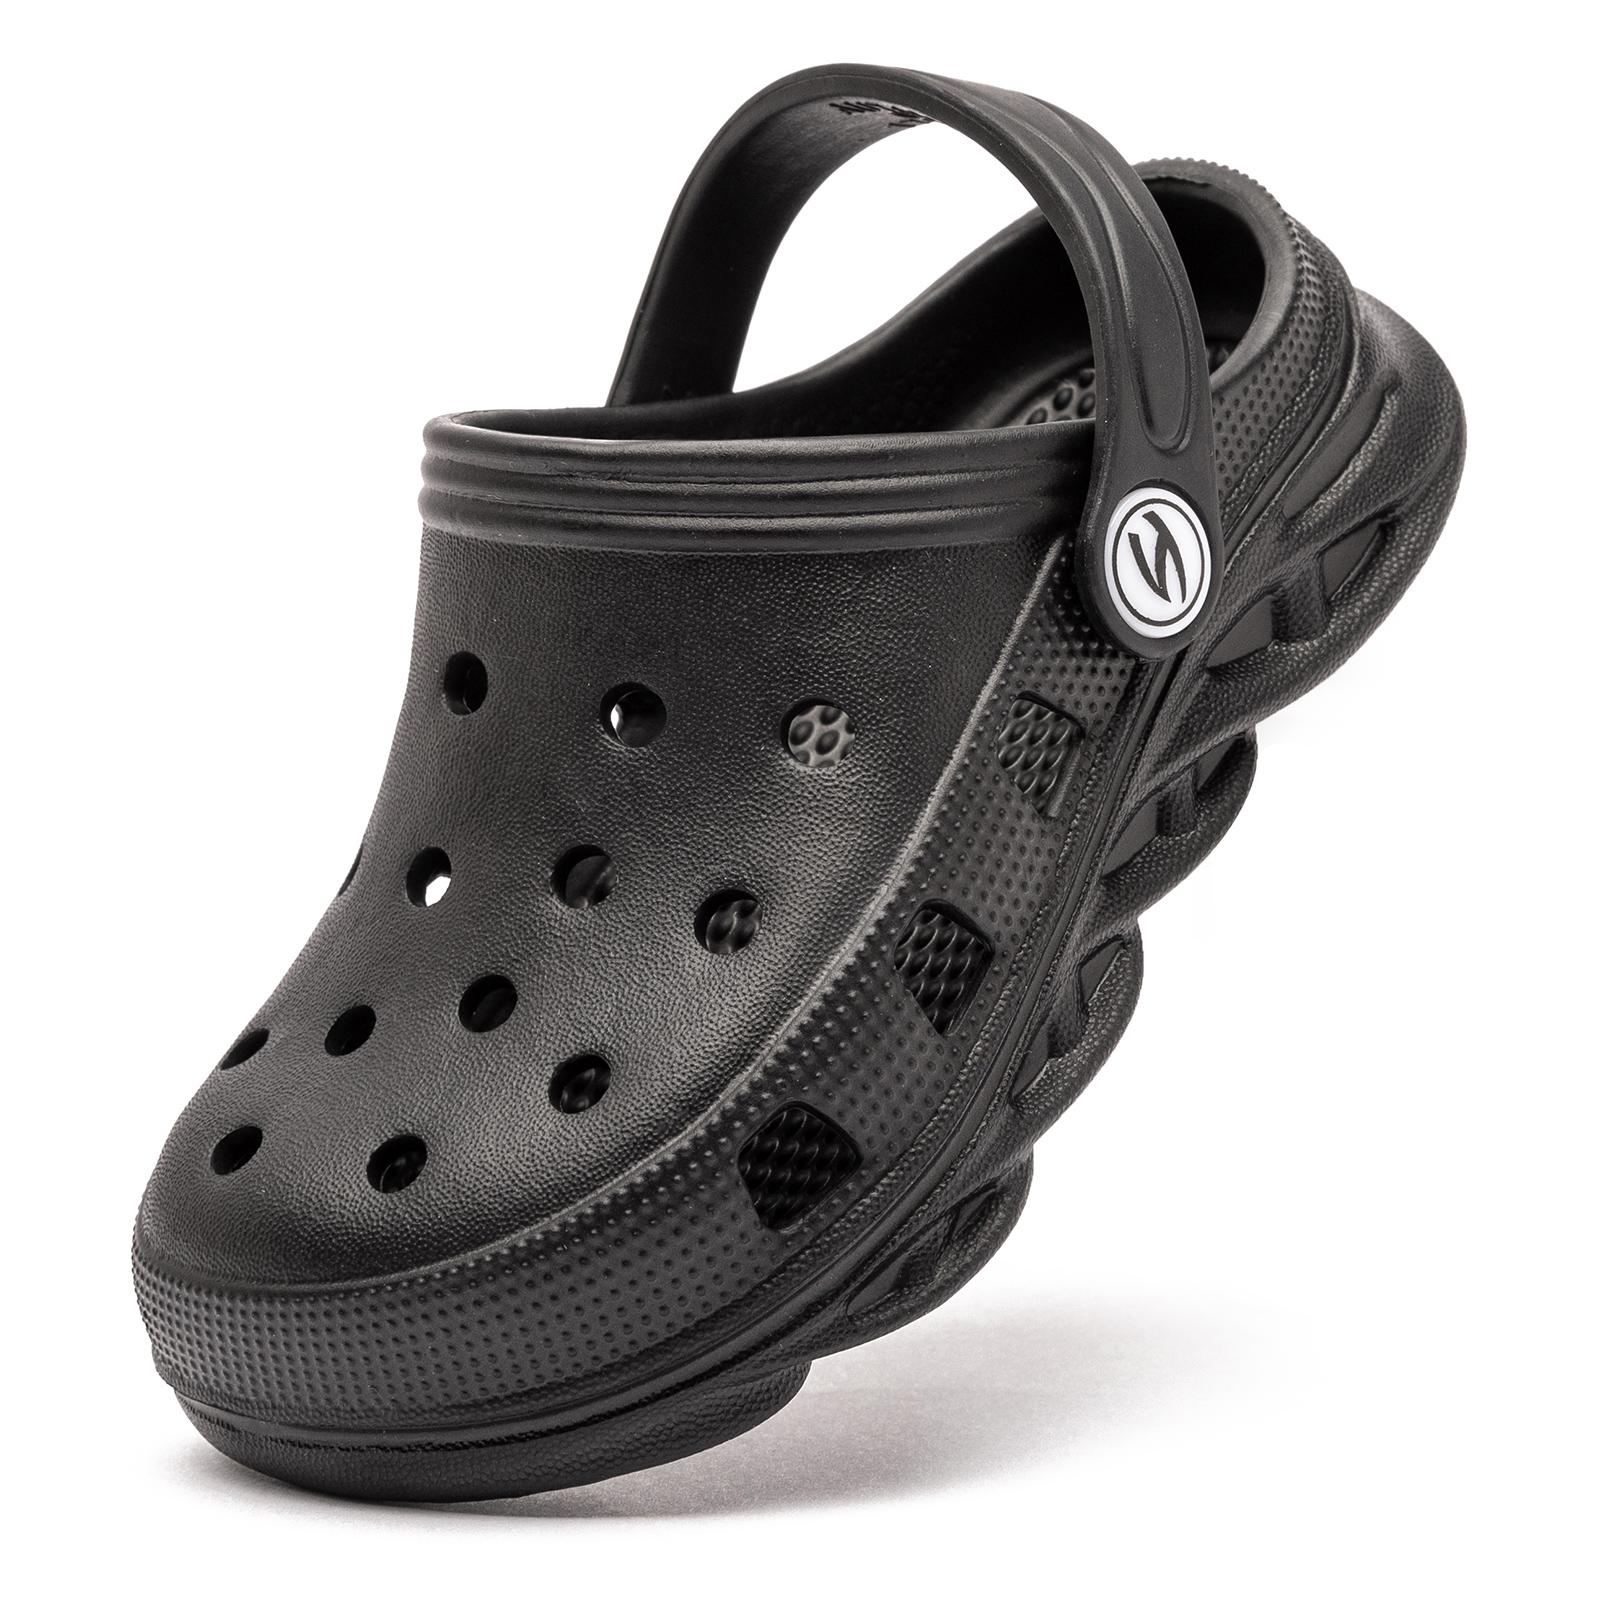 Hobibear 2021 Summer Walking Sandal EVA Black Medical Clogs for Women Garden Classical Shoes